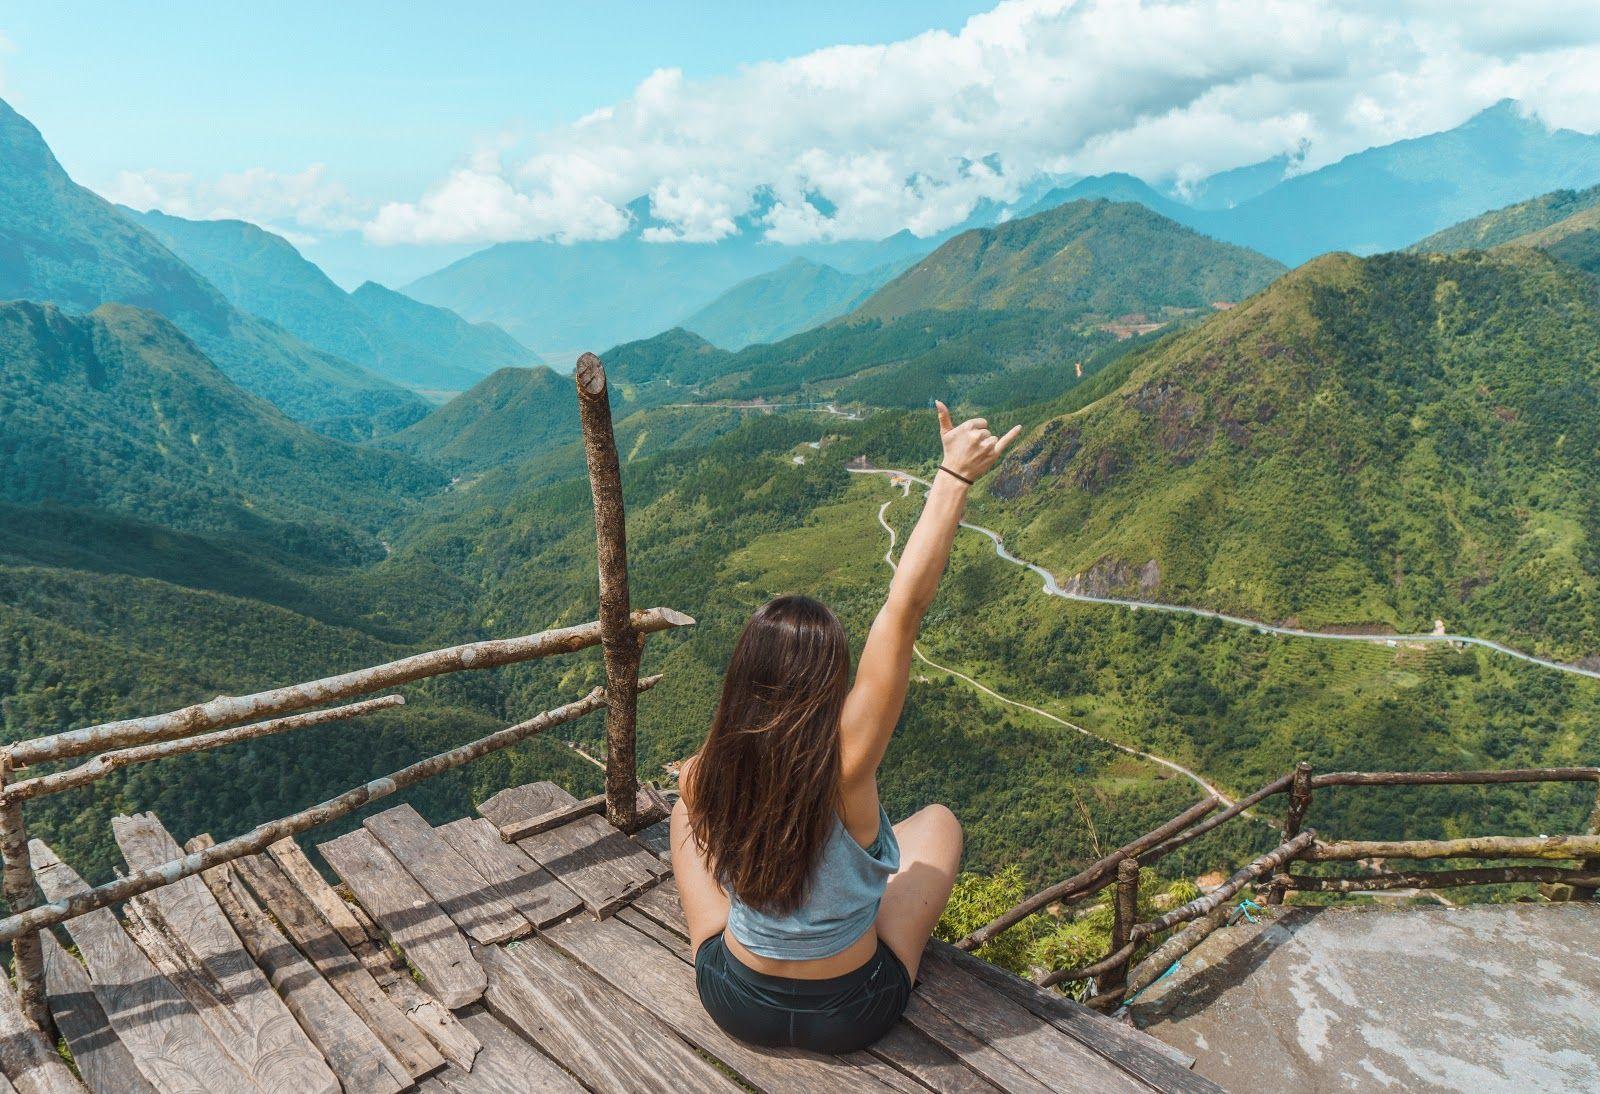 #sapa #visitvietnam #thingstodo #travelholic #travelforever #traveleveryday #traveller #blogger #travelblogger #tips #traveltips #travelaroundtheworld #travelagency #travelasia #goodvibes